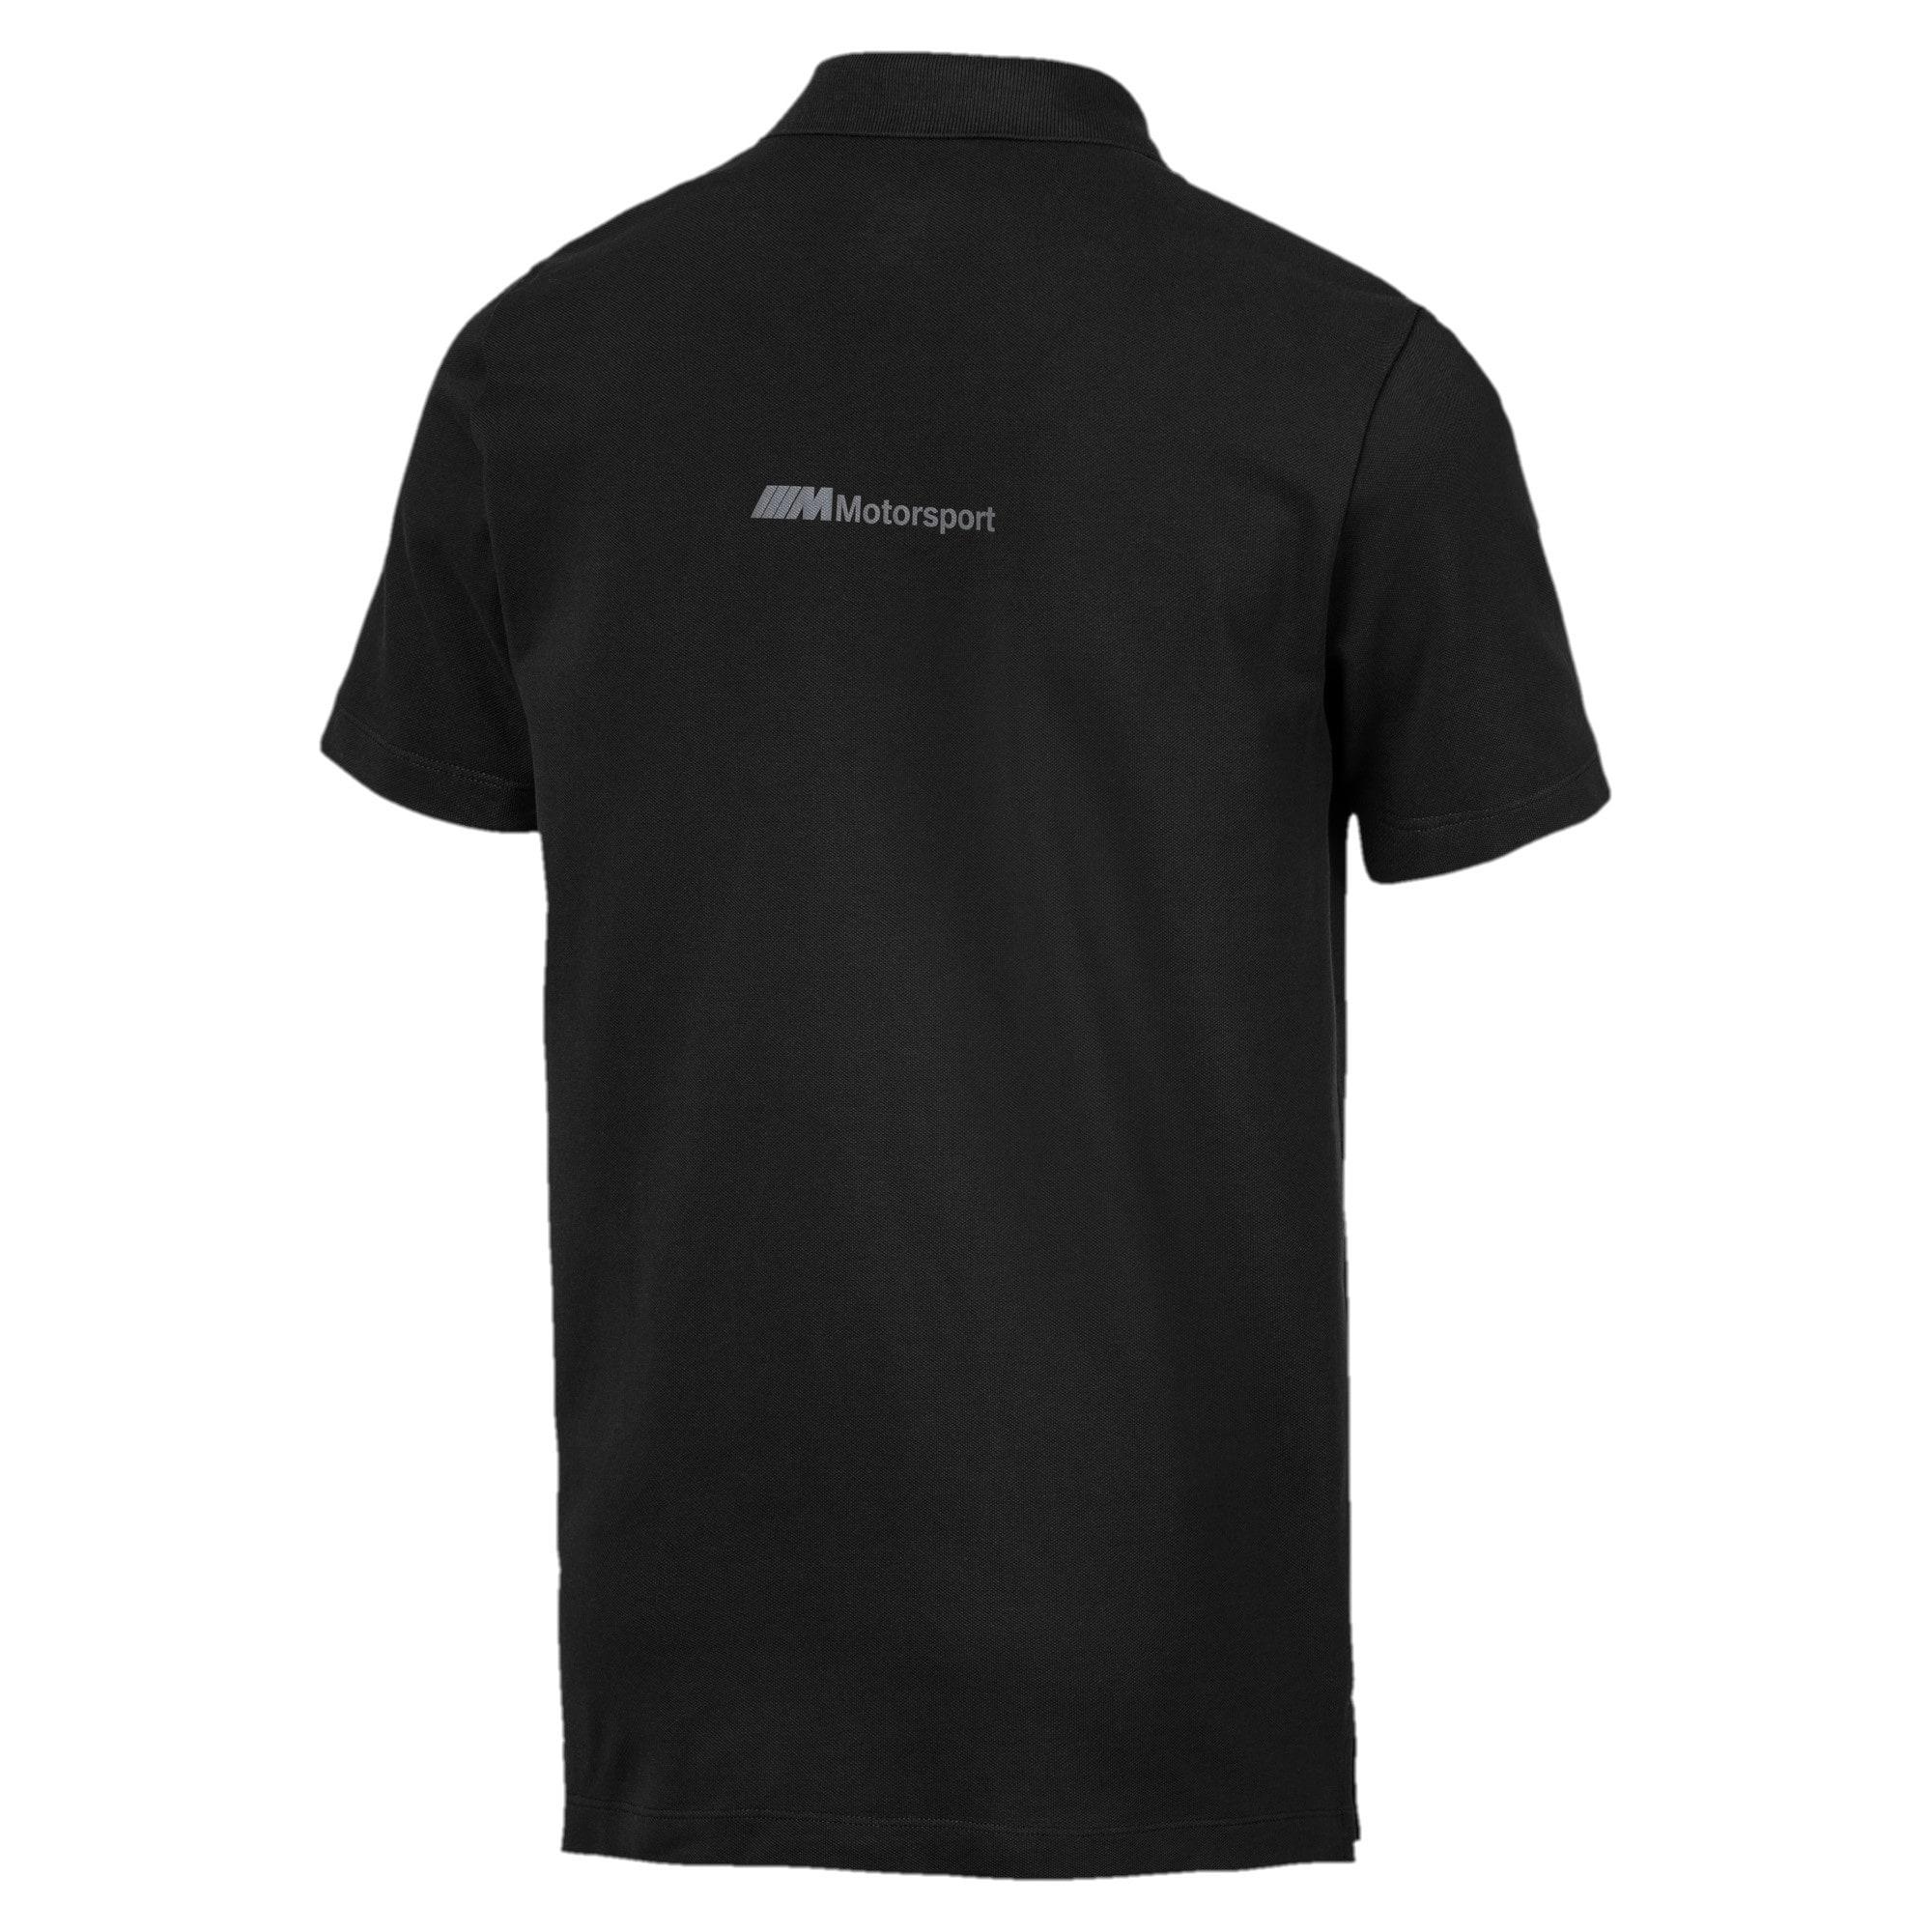 Thumbnail 2 of BMW M Motorsport Life Men's Graphic Polo, Puma Black, medium